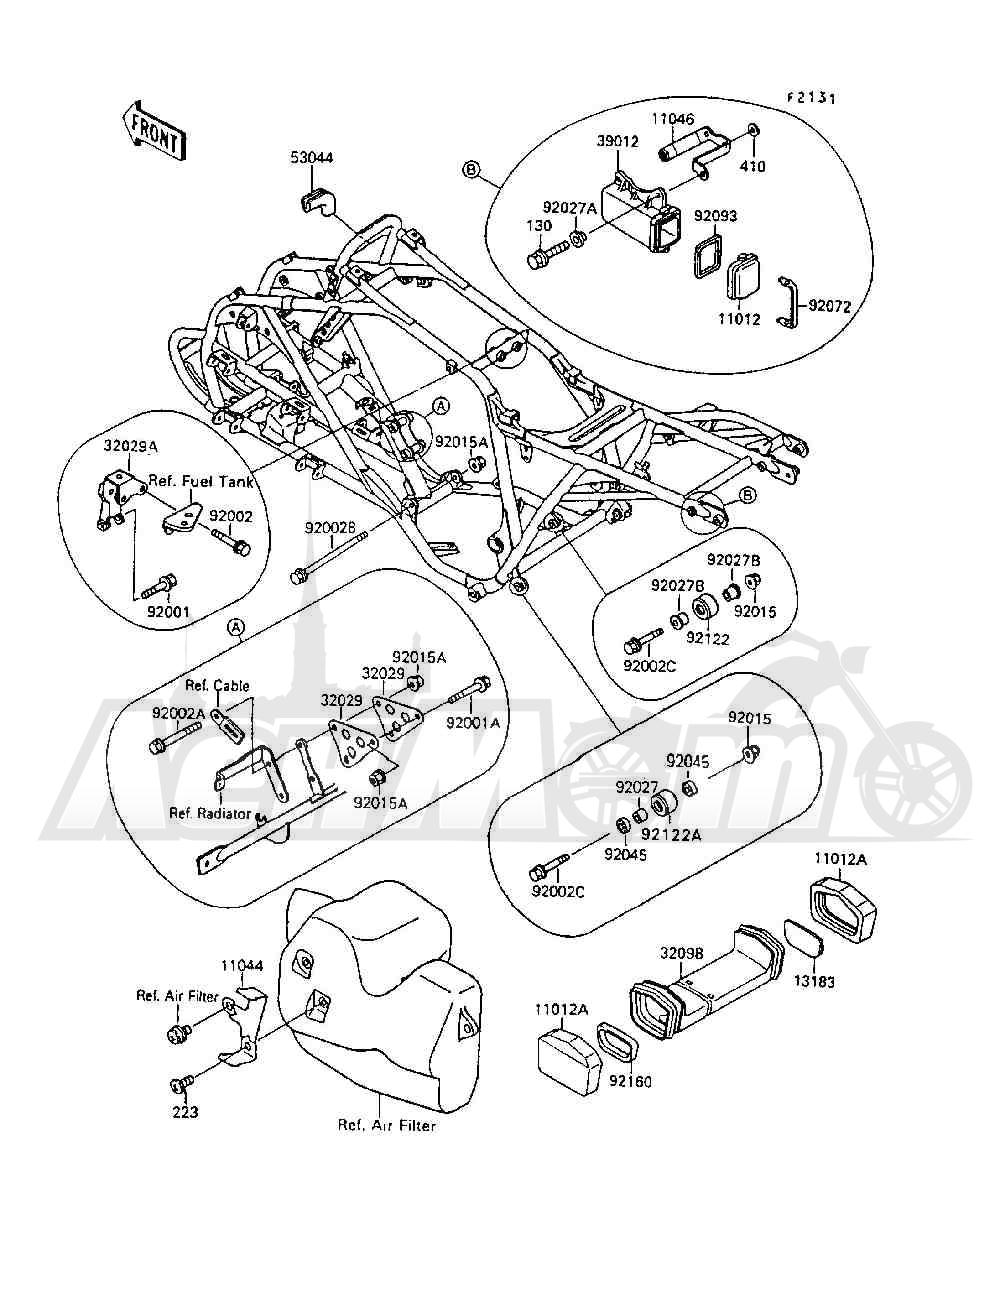 Запчасти для Квадроцикла Kawasaki 1994 MOJAVE 250 (KSF250-A8) Раздел: FRAME FITTINGS | рама фитинги